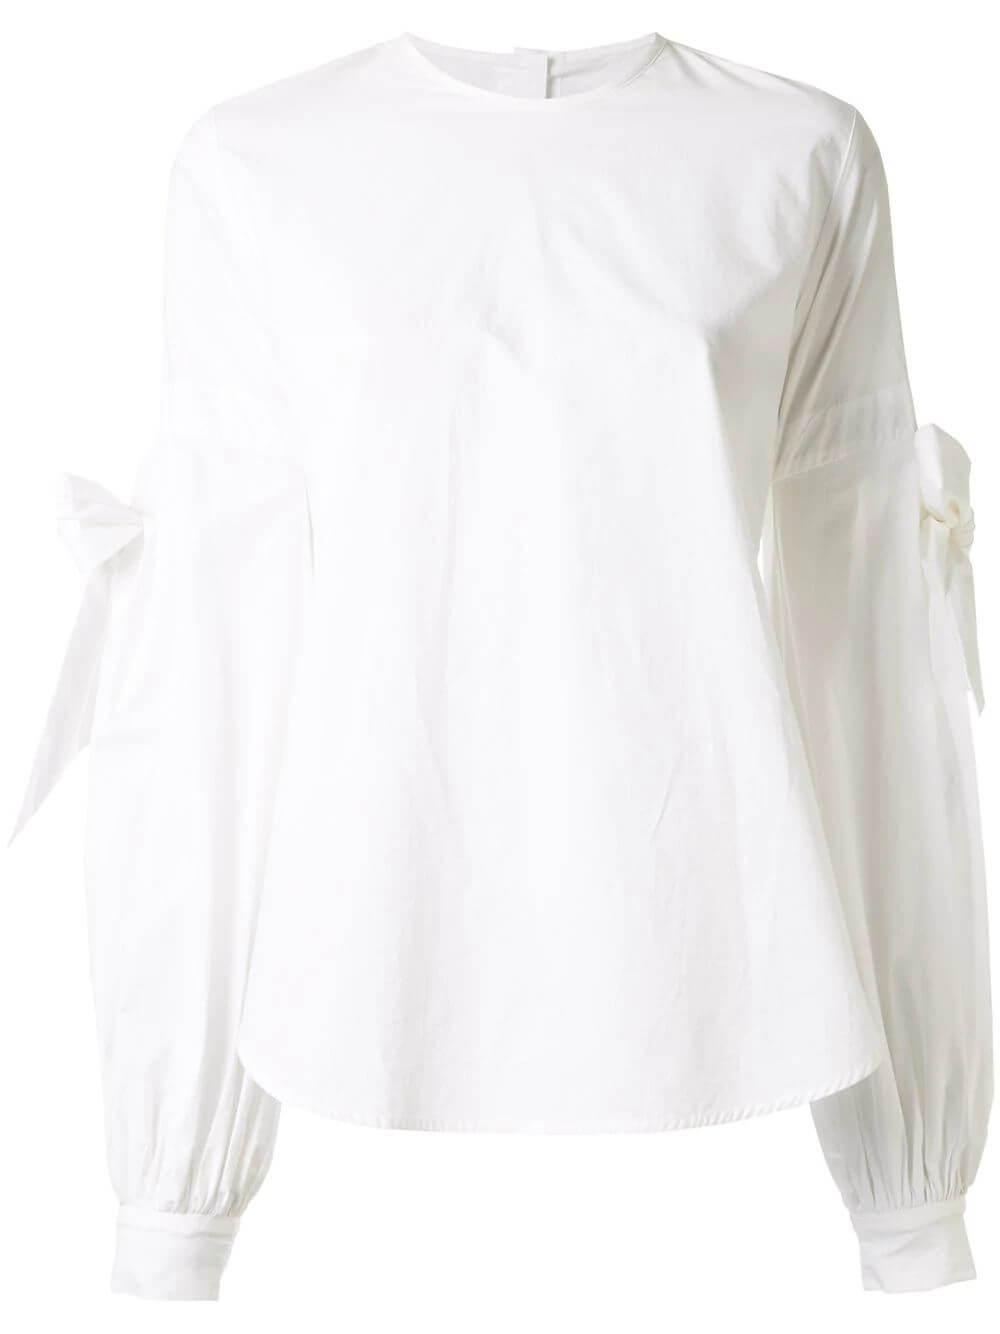 Full Sleeve Blouse Item # GALESIA-BLOUSE